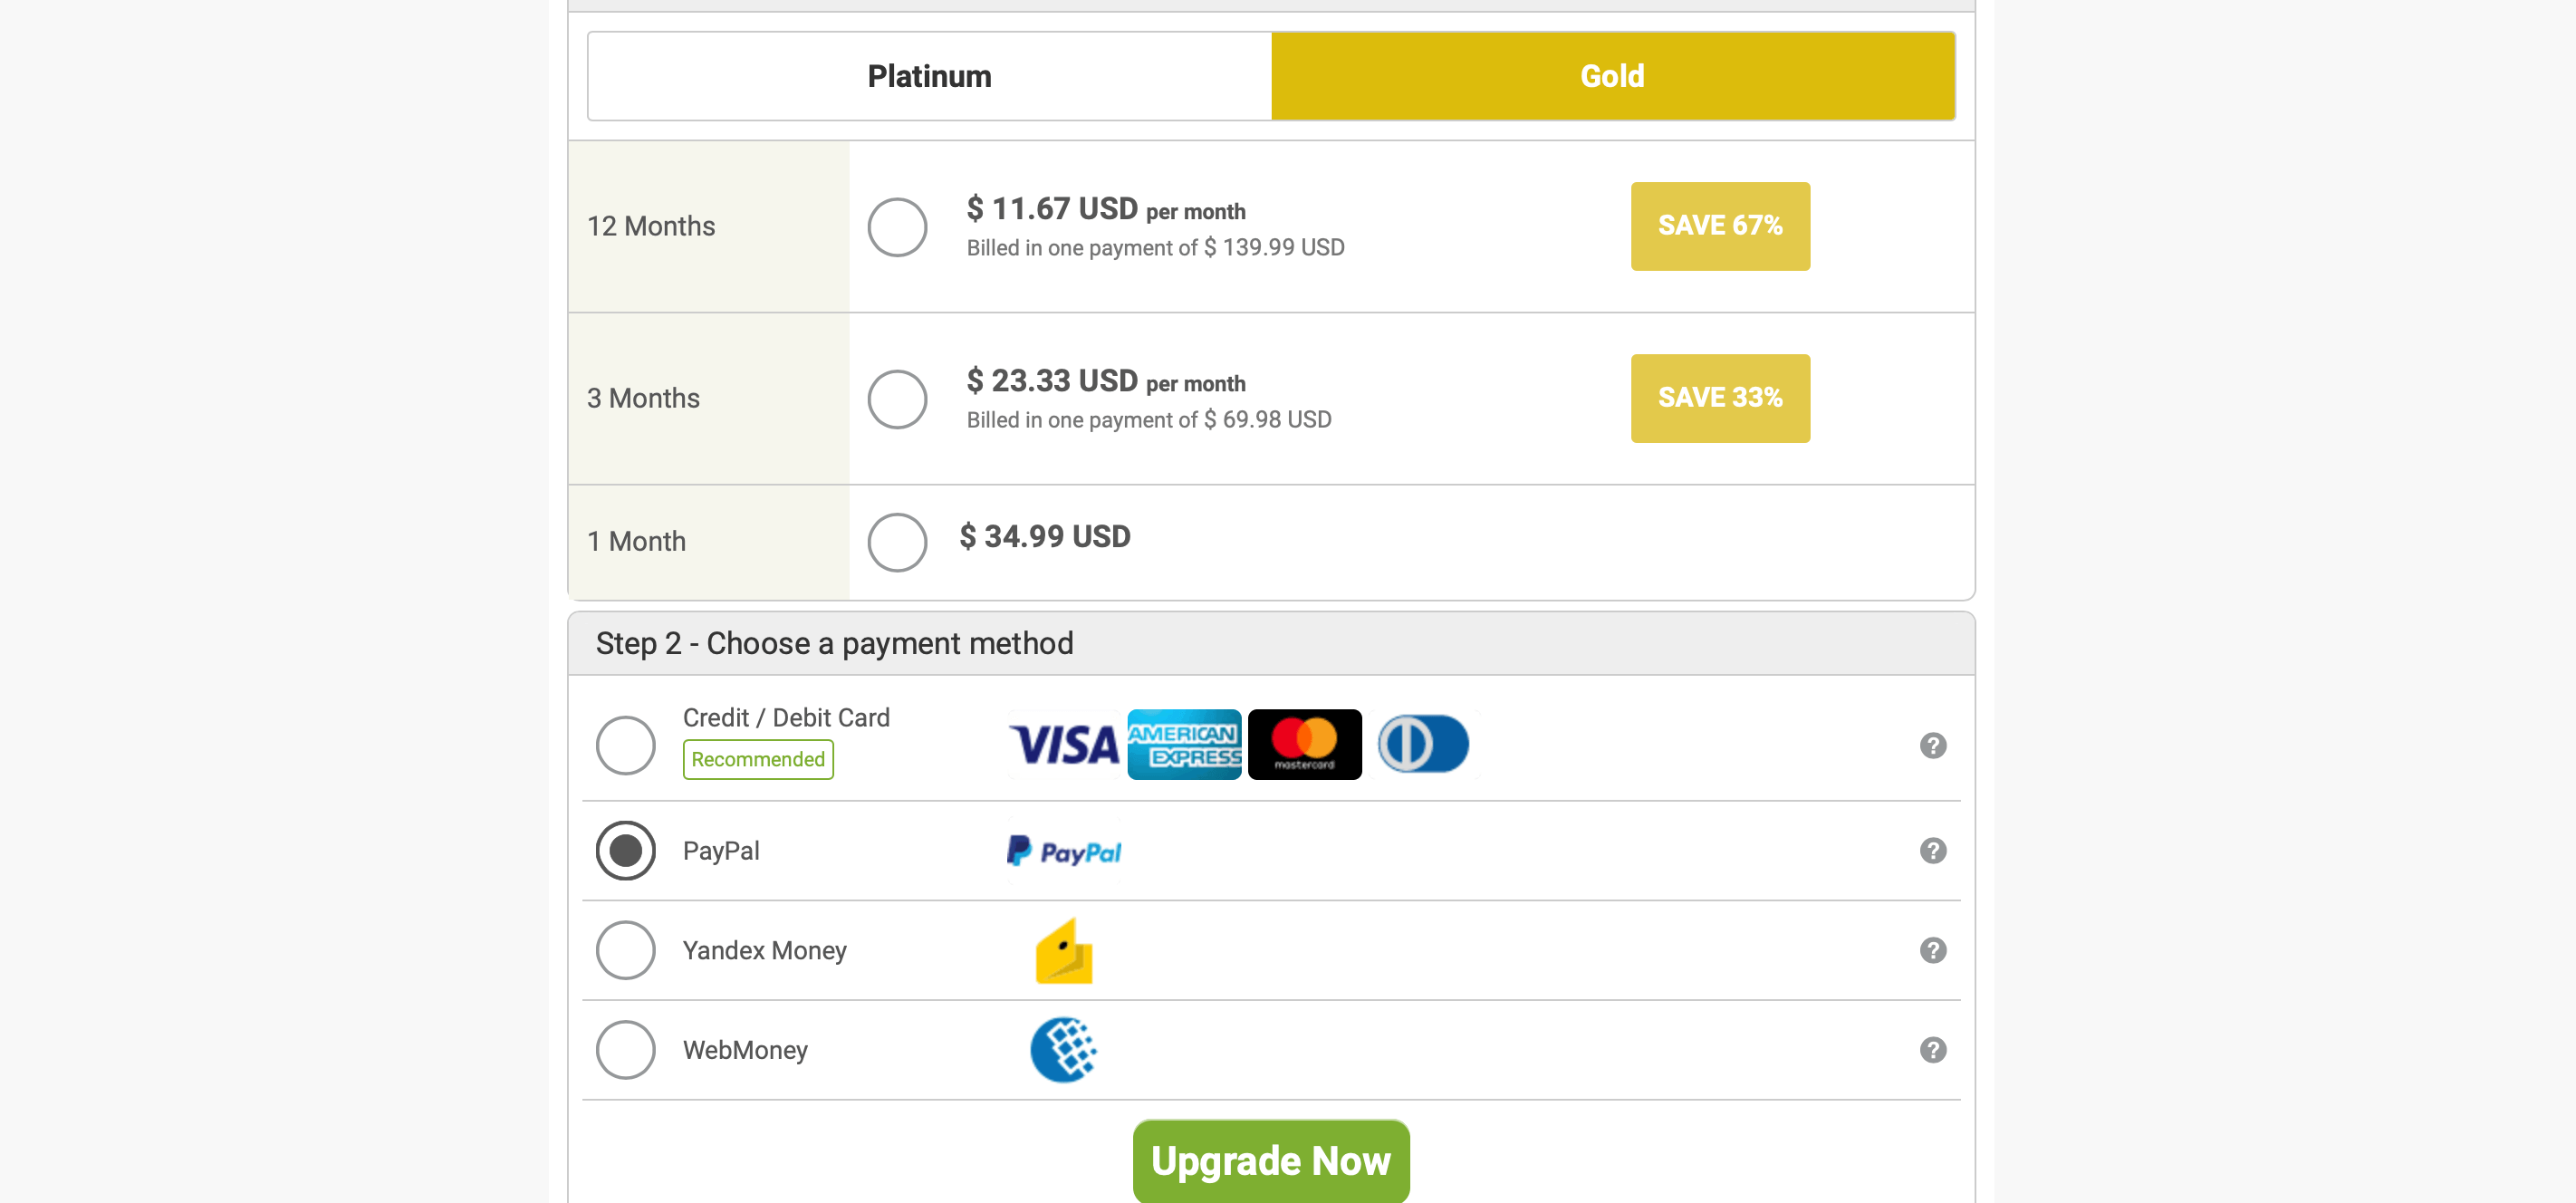 FilipinoCupid Gold Price